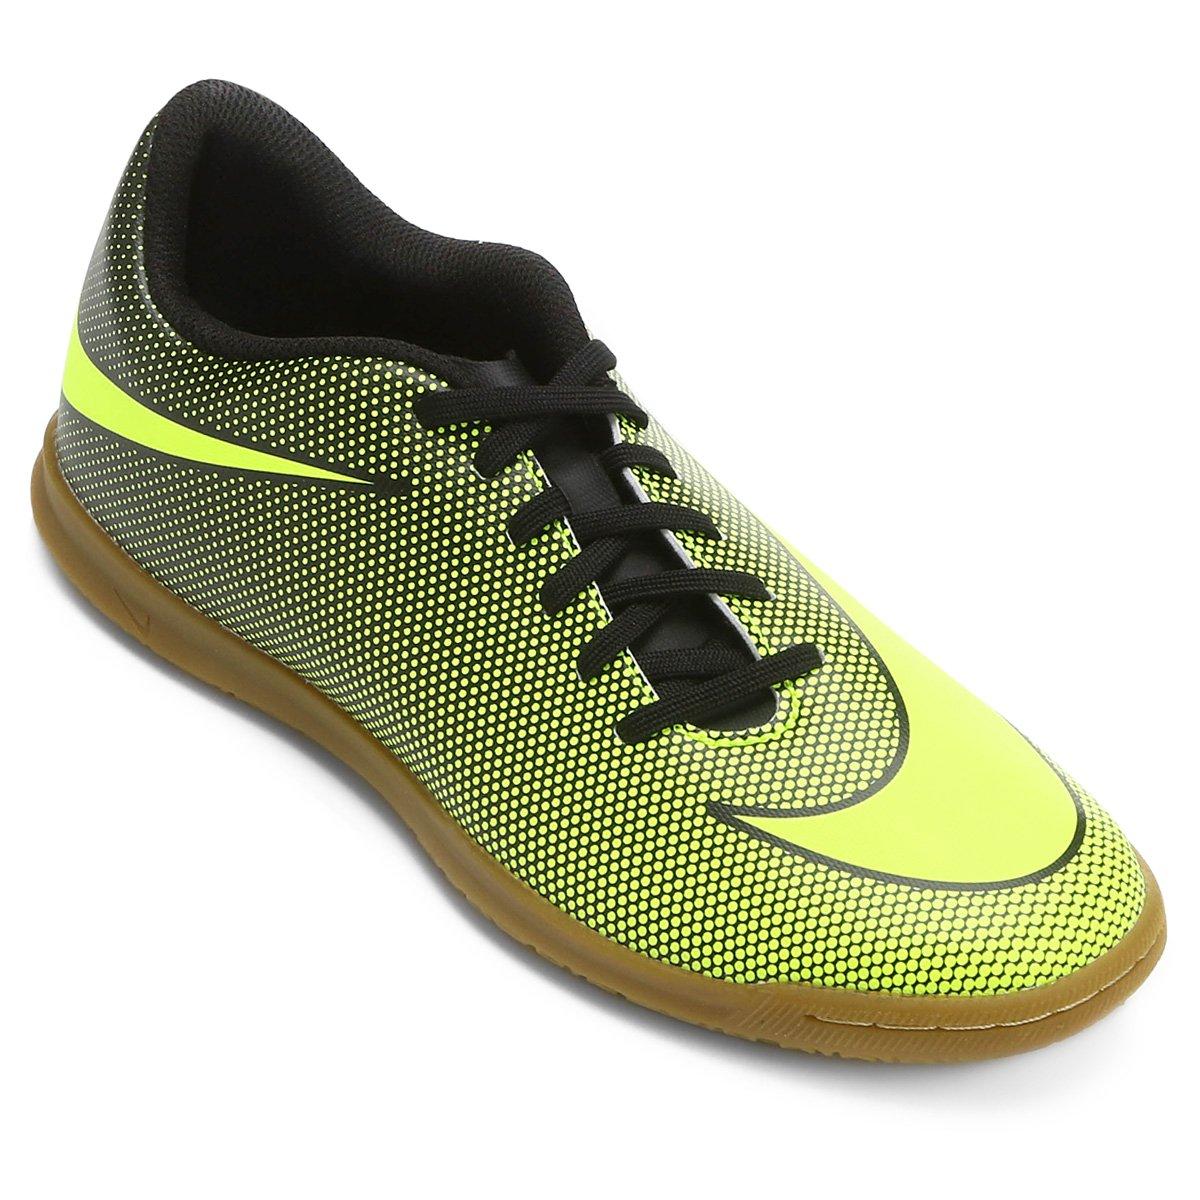 696602a03de63 Chuteira Futsal Nike Bravata 2 IC - Preto e Amarelo - Compre Agora ...